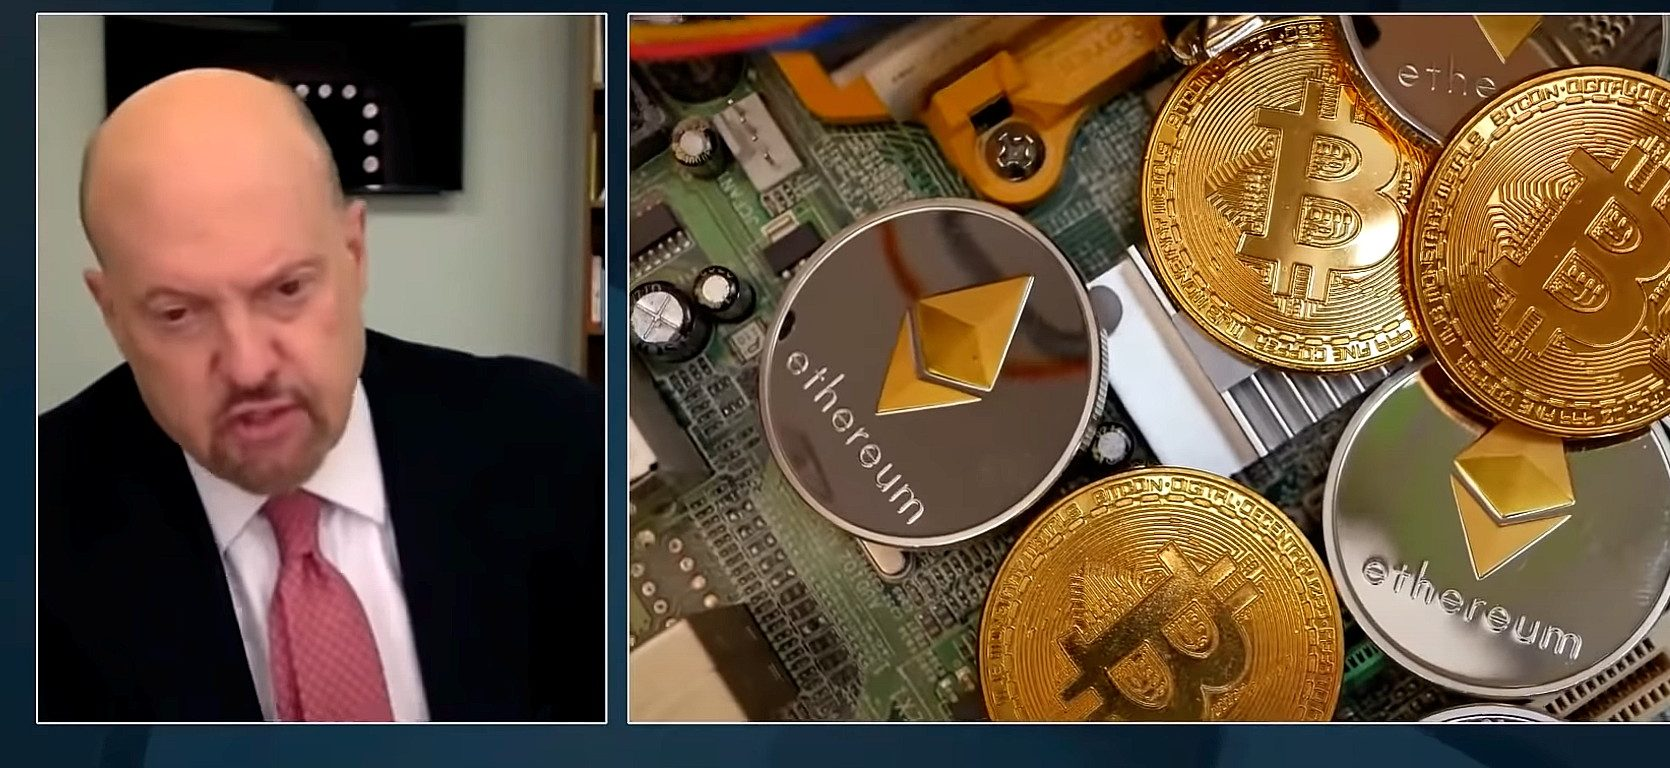 tesla-bitcoin-reversal-jim-cramer-opinion